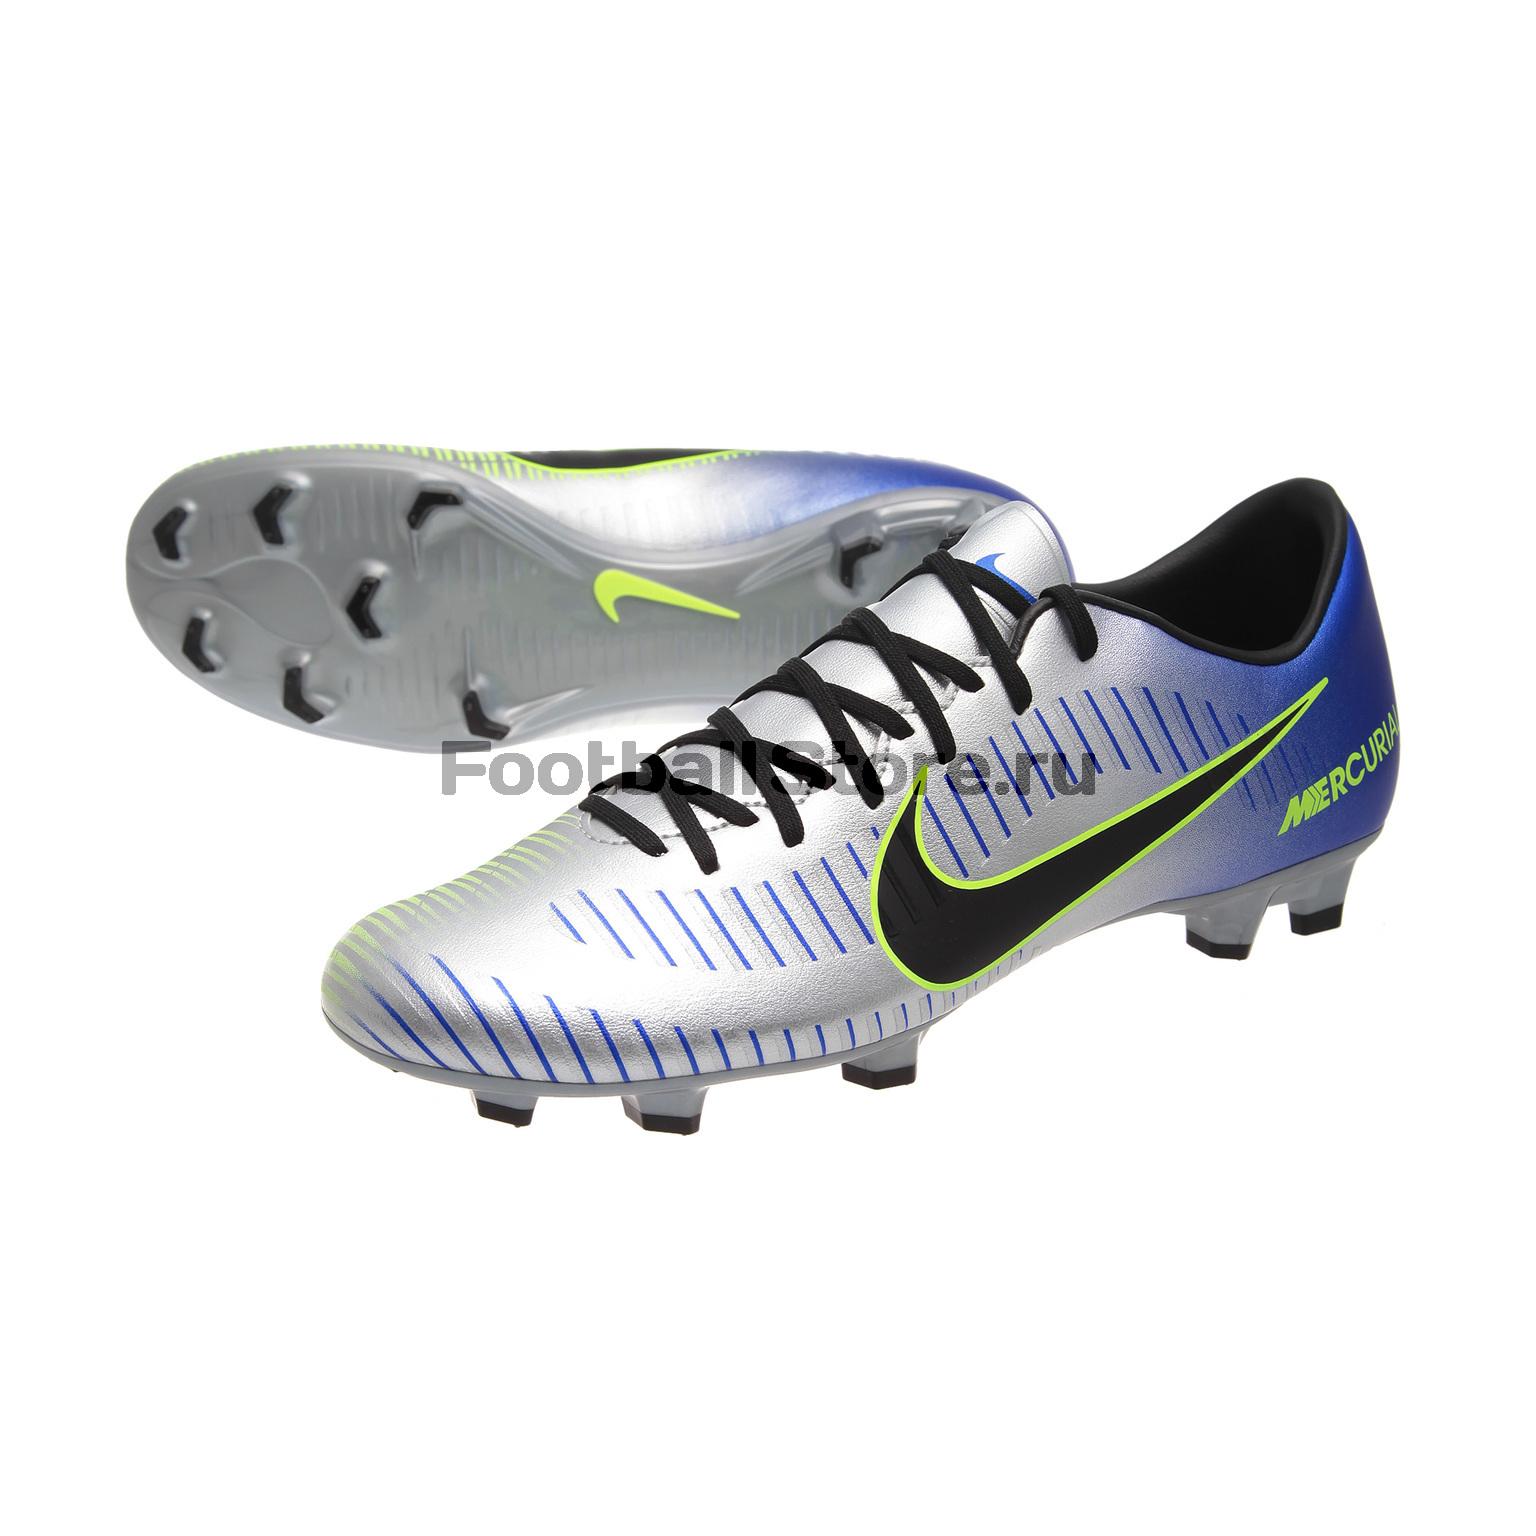 Бутсы Nike Mercurial Victory VI Neymar FG 921509-407 бутсы футбольные nike mercurial victory vi njr fg 921488 407 jr детские